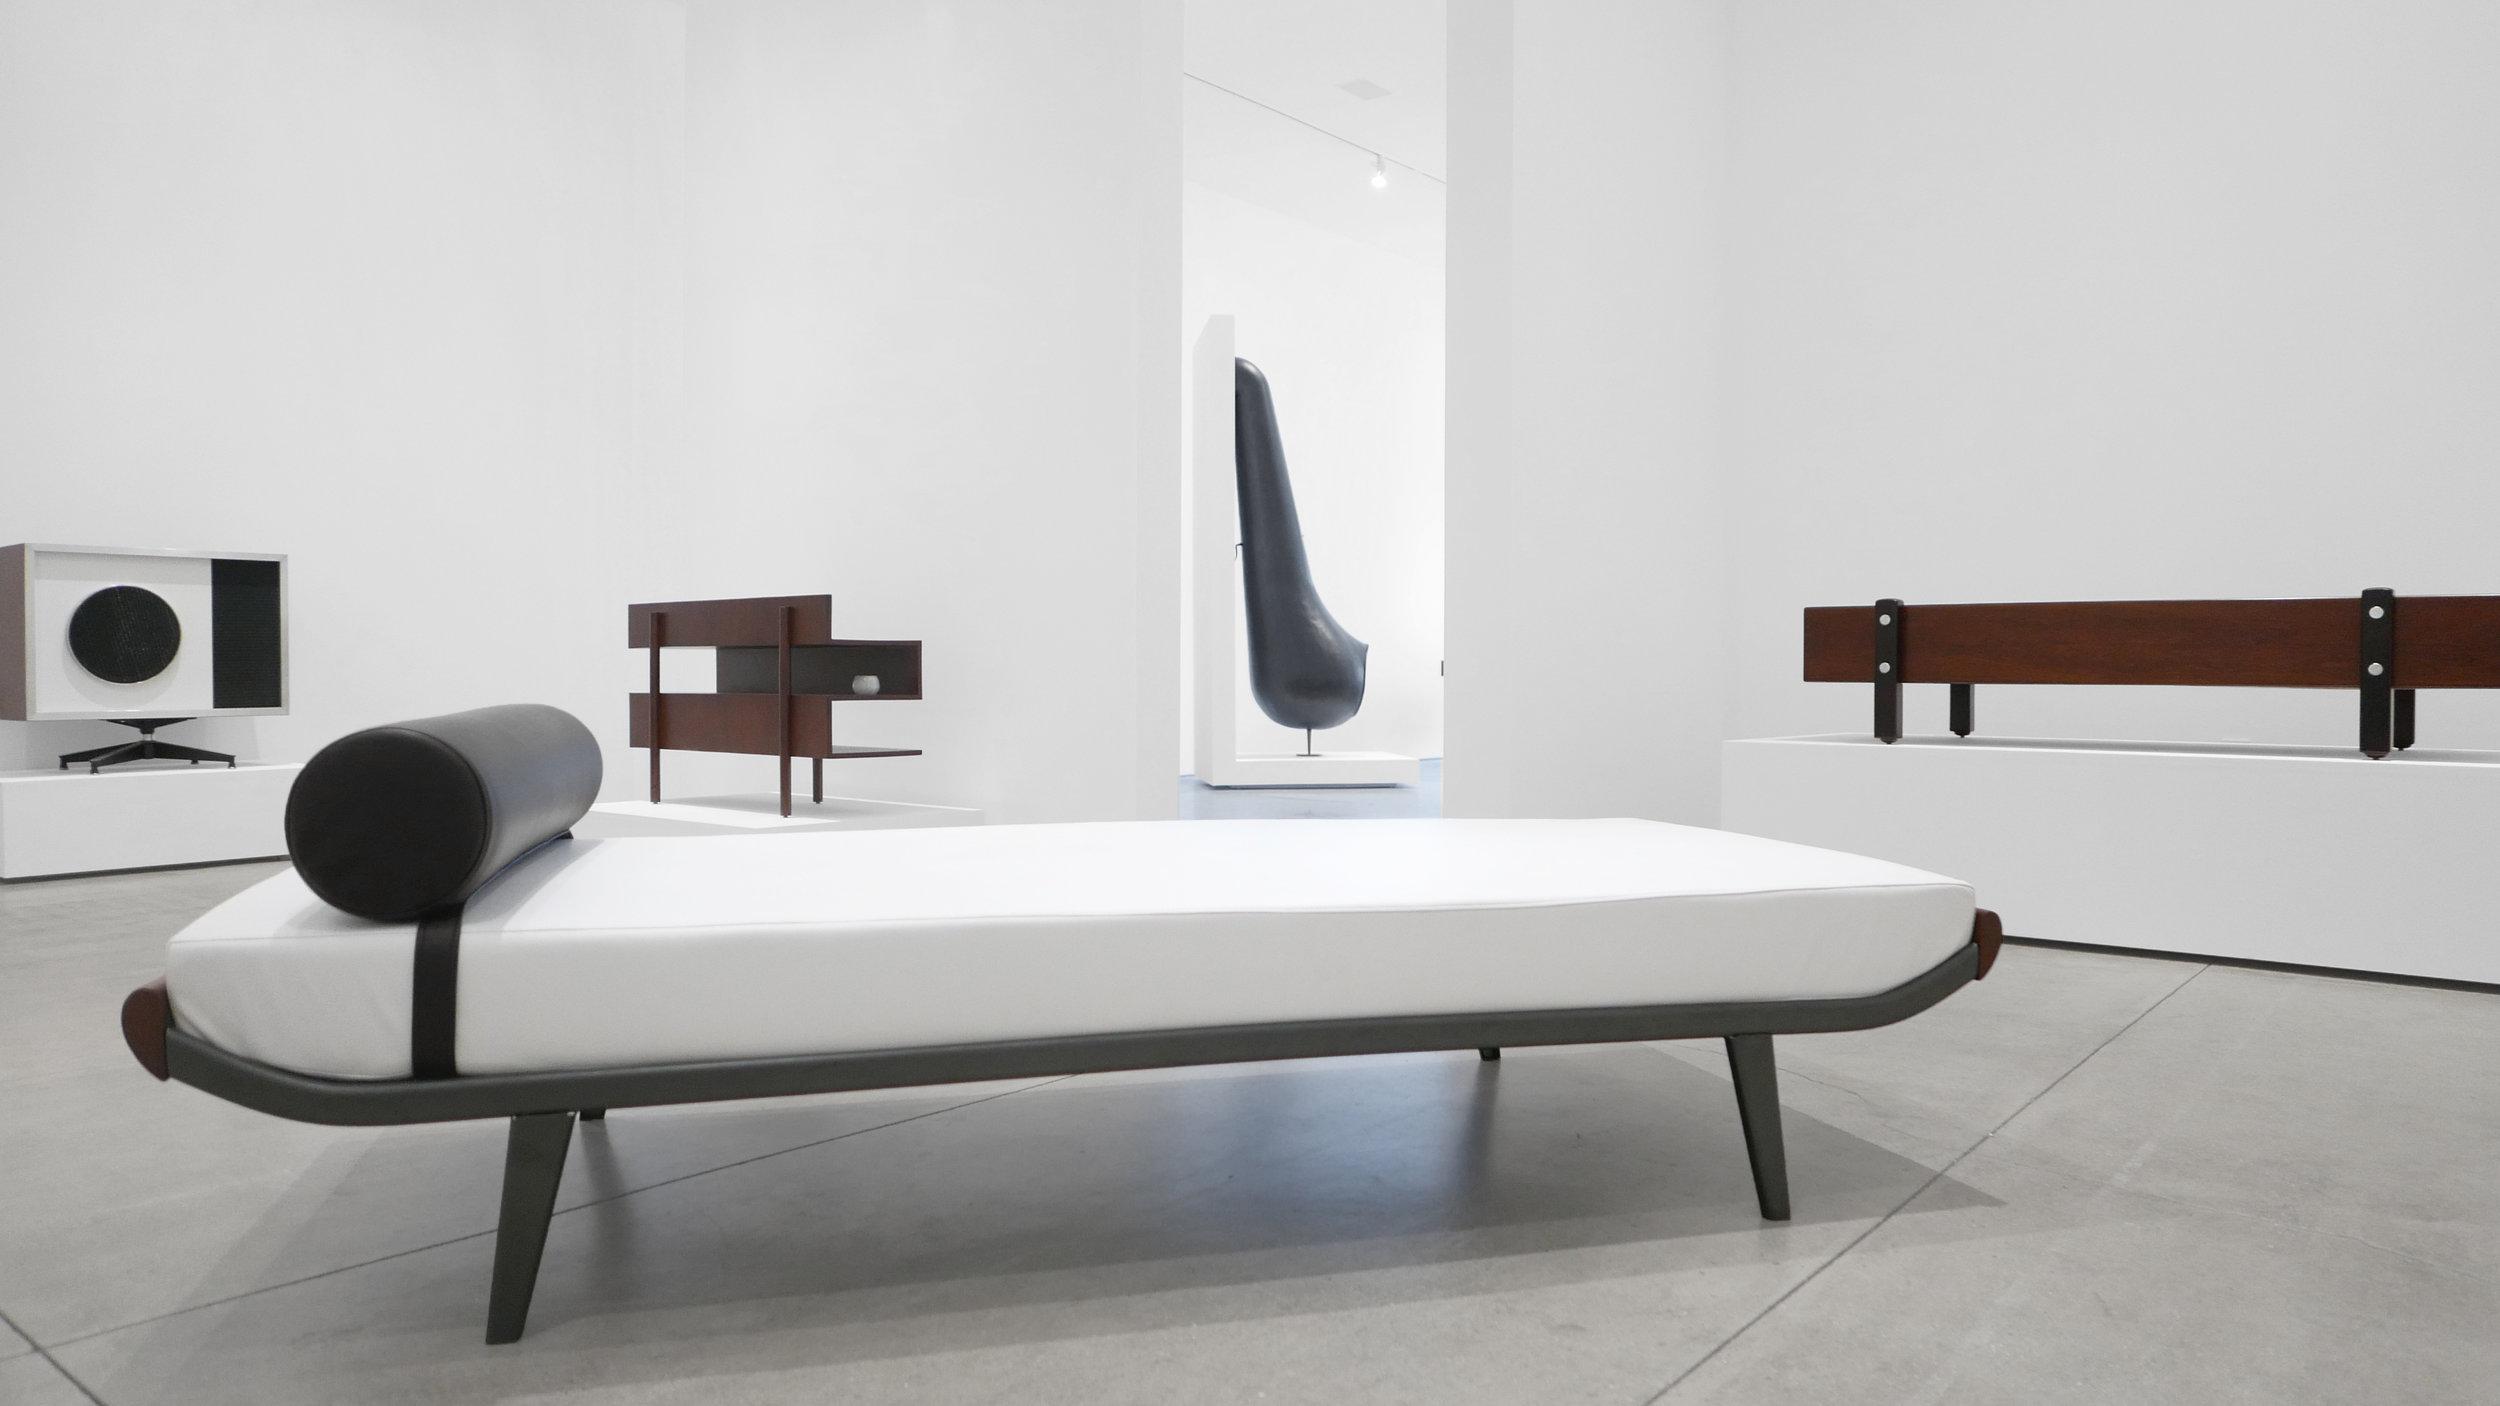 'The Tendency of the Moment - International Design, The Bauhaus Through Modern', Peter Blake Gallery, 2016, Installation View_6.jpg